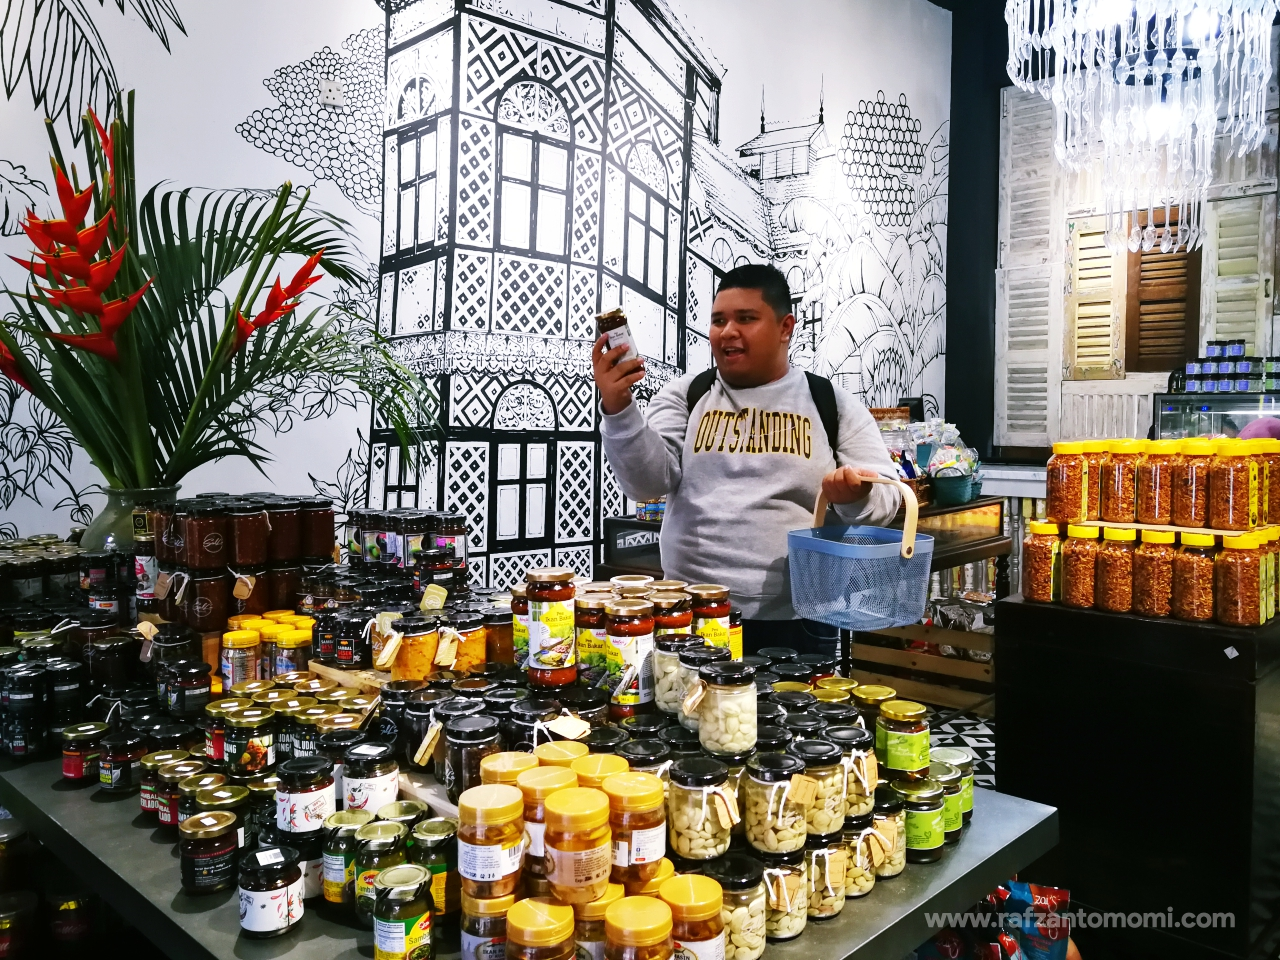 Perlis Week Di Foodmarket™ Pada 12 Disember hingga 16 Disember 2018!